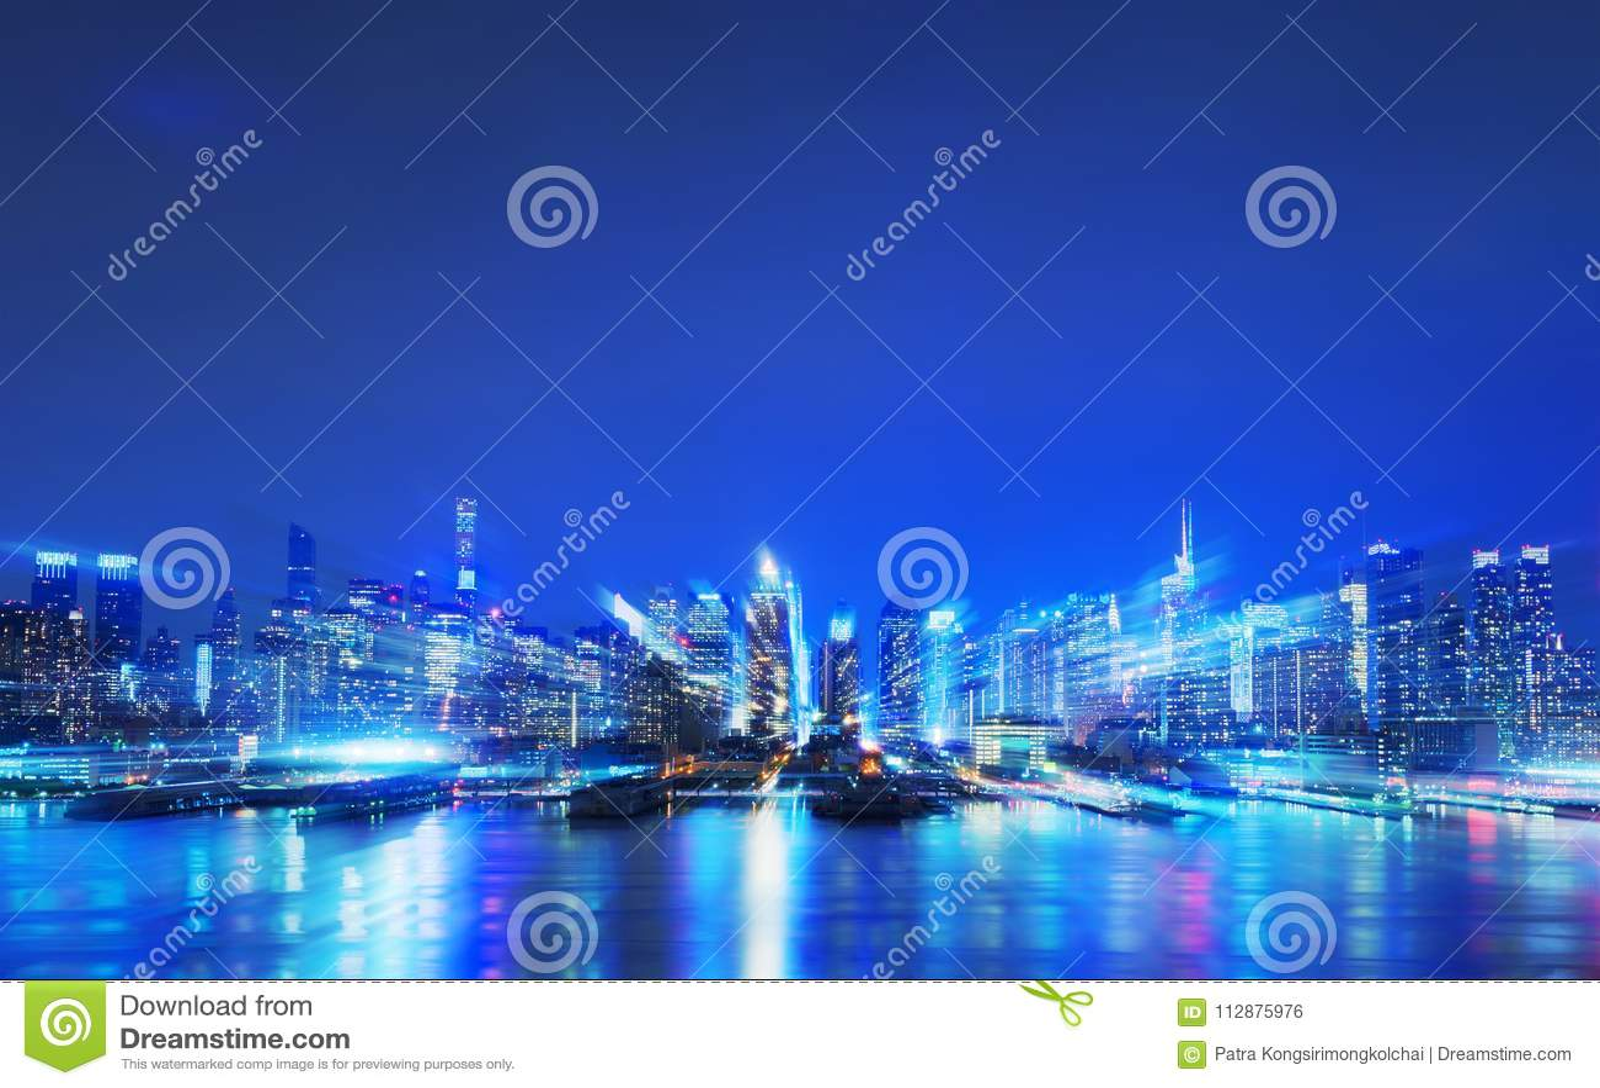 Virtual city, Abstract digital New York skyscrapers